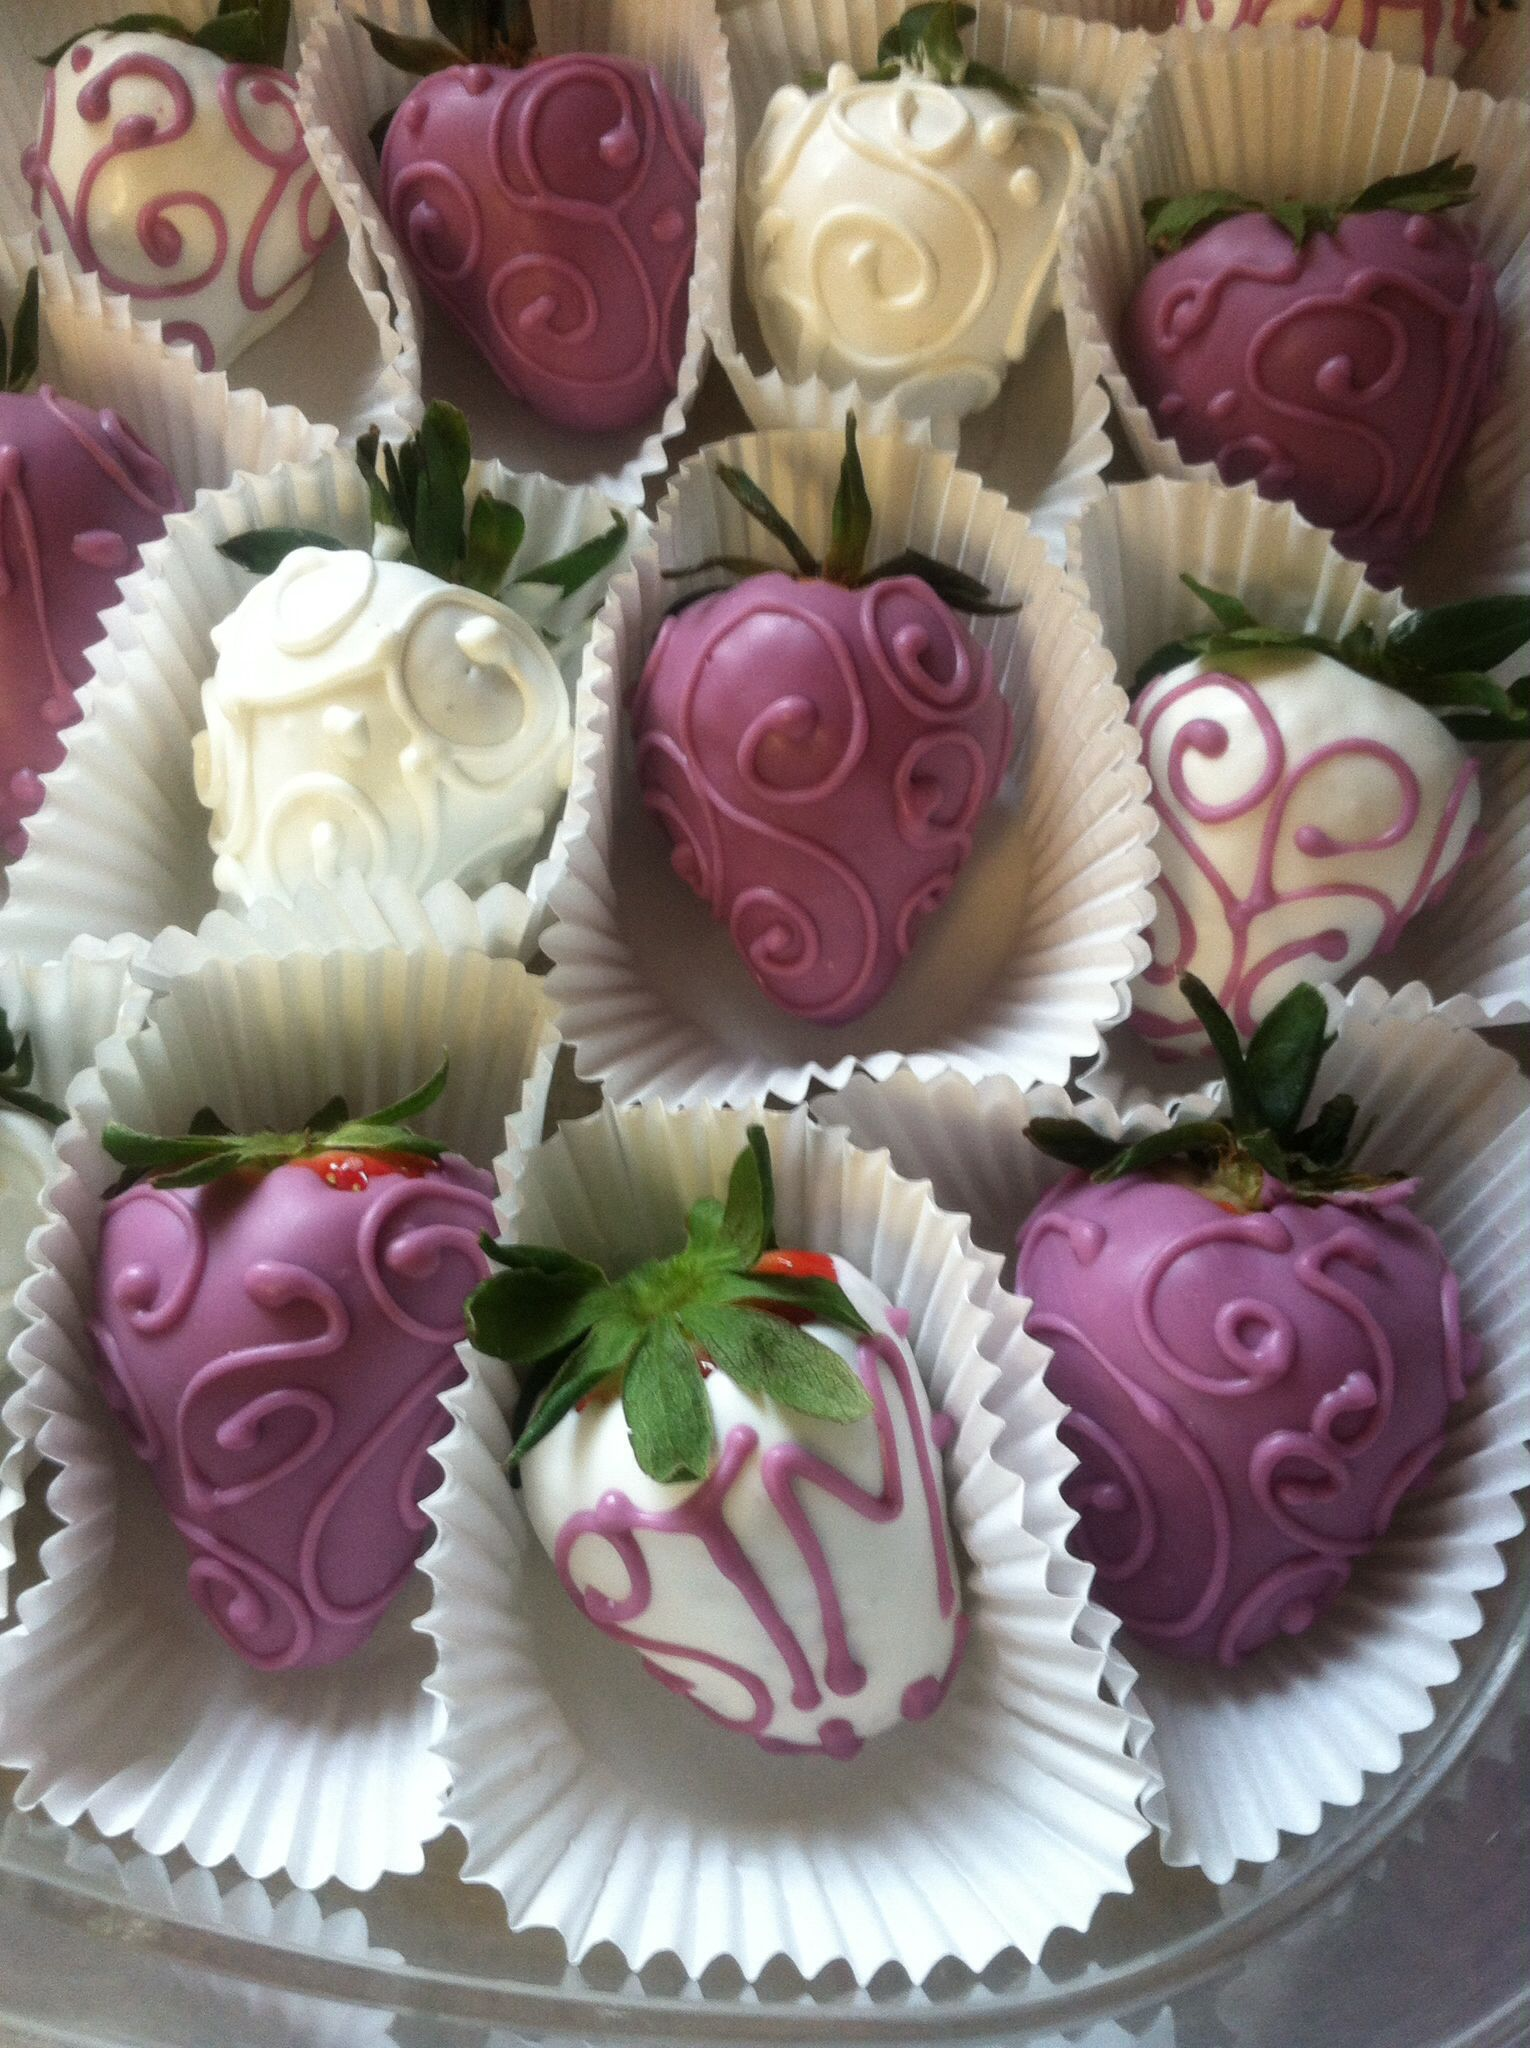 Chocolate covered strawberries #designed #purple #white |